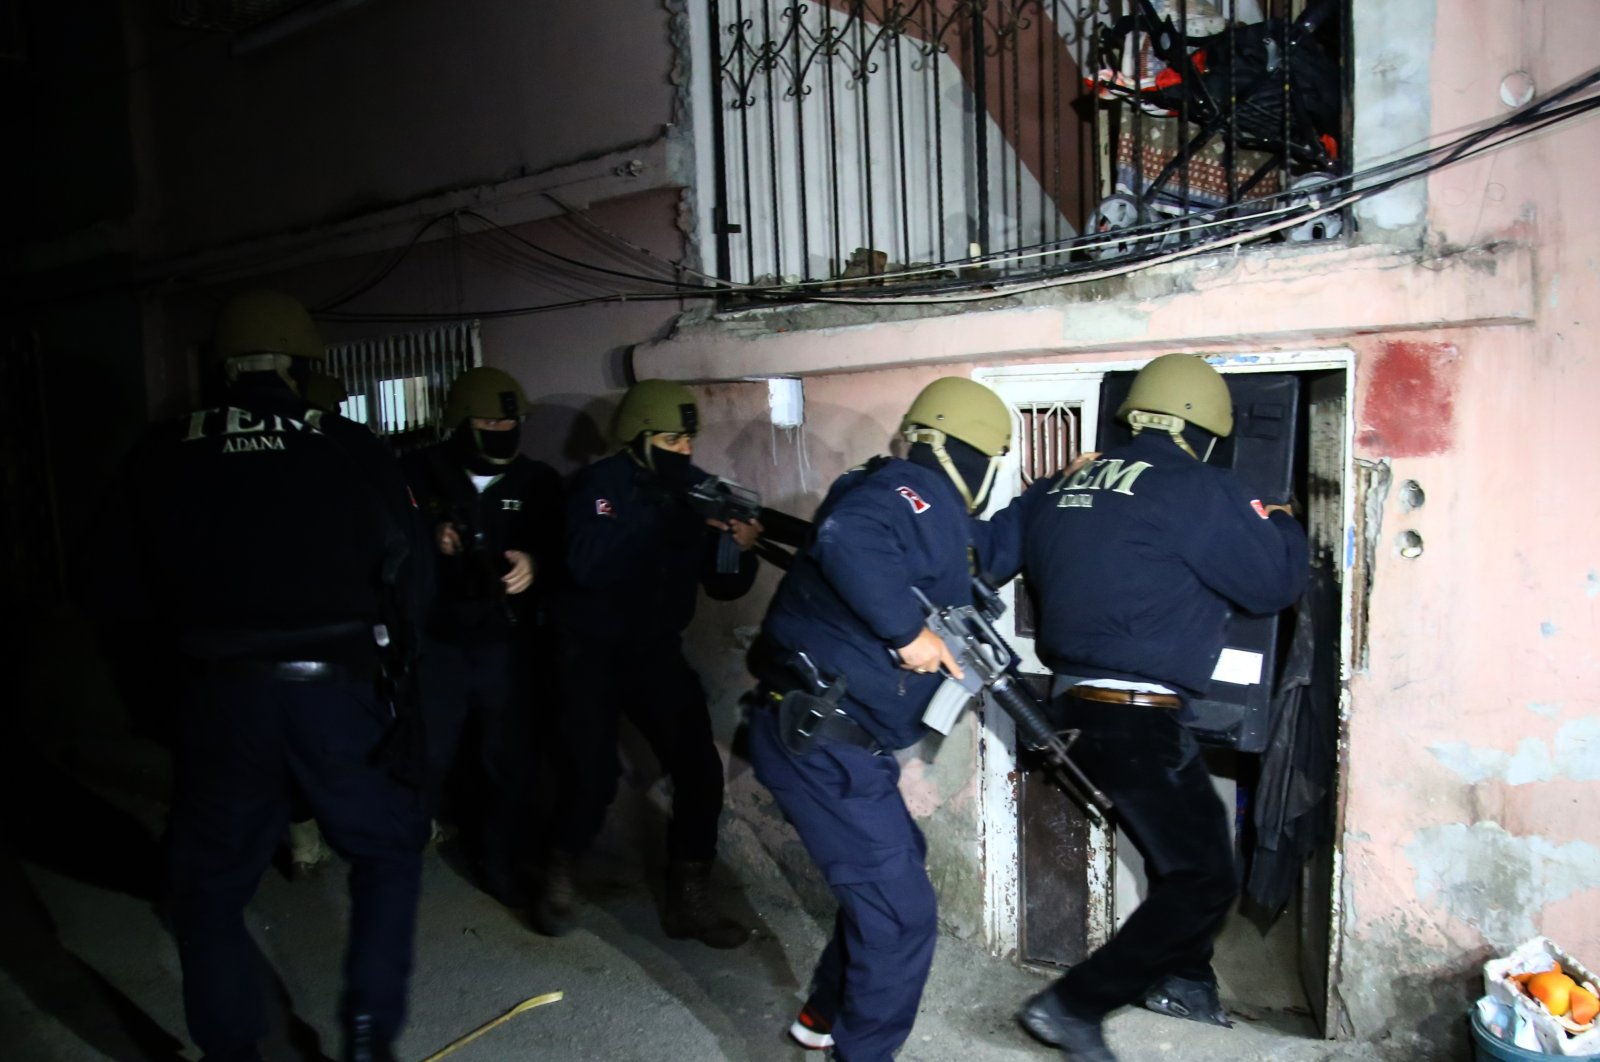 Turkish counterterrorism police squads raid a Daesh terrorist cell in southern Adana province, Turkey, Feb. 18, 2021. (AA File Photo)